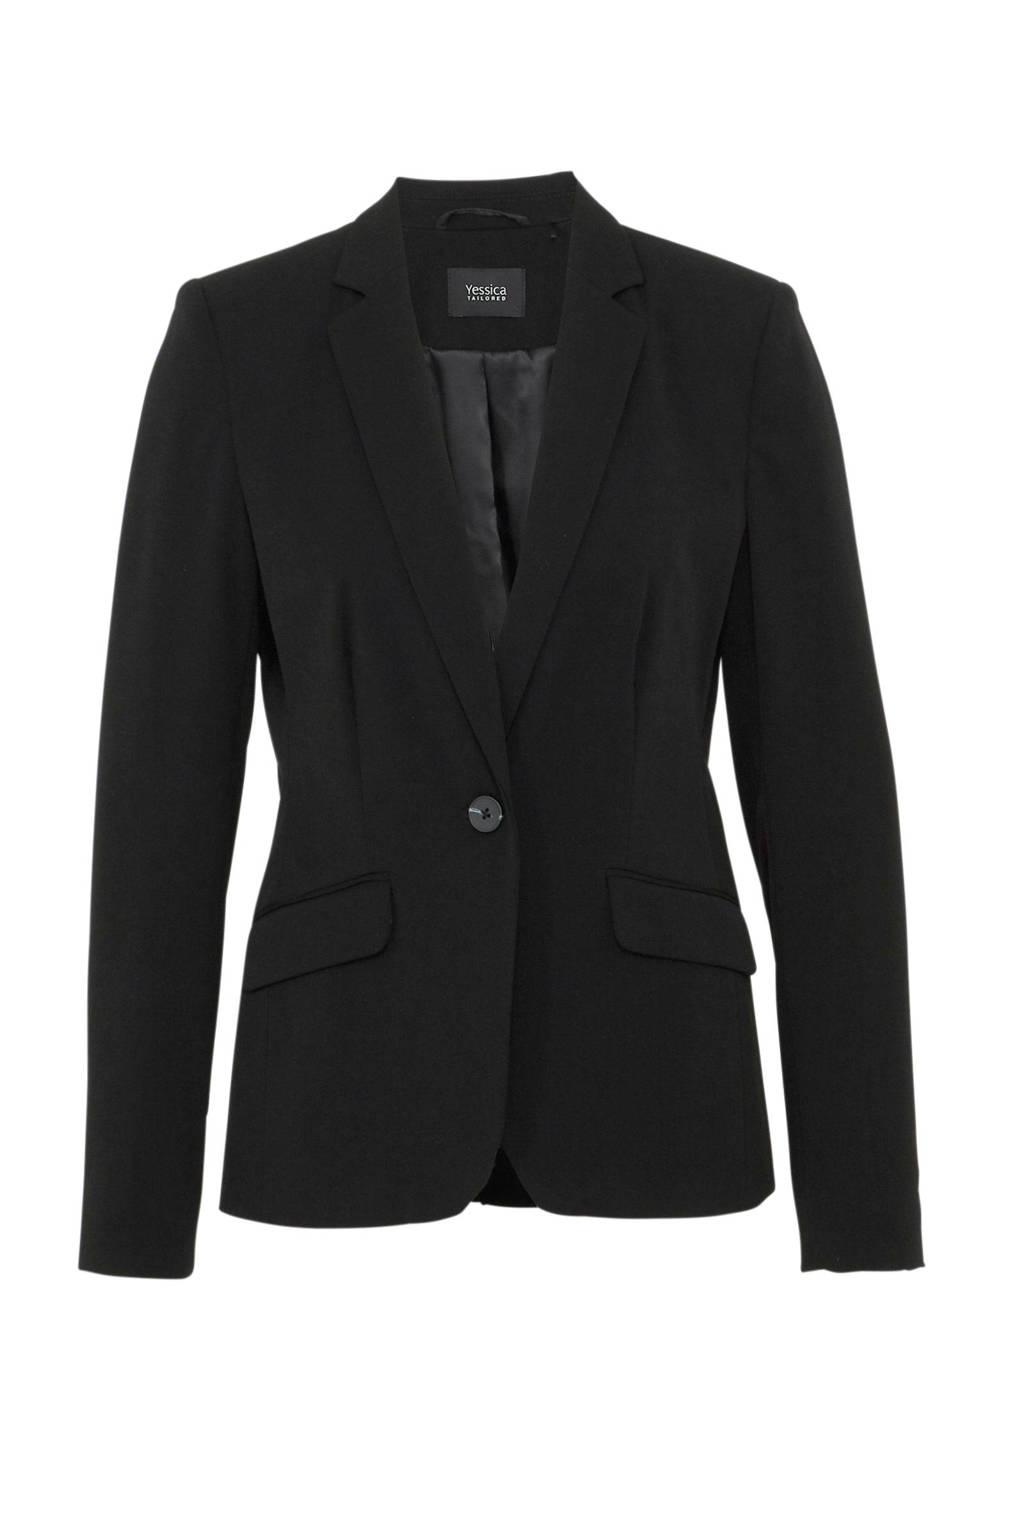 C&A Yessica blazer zwart, Zwart